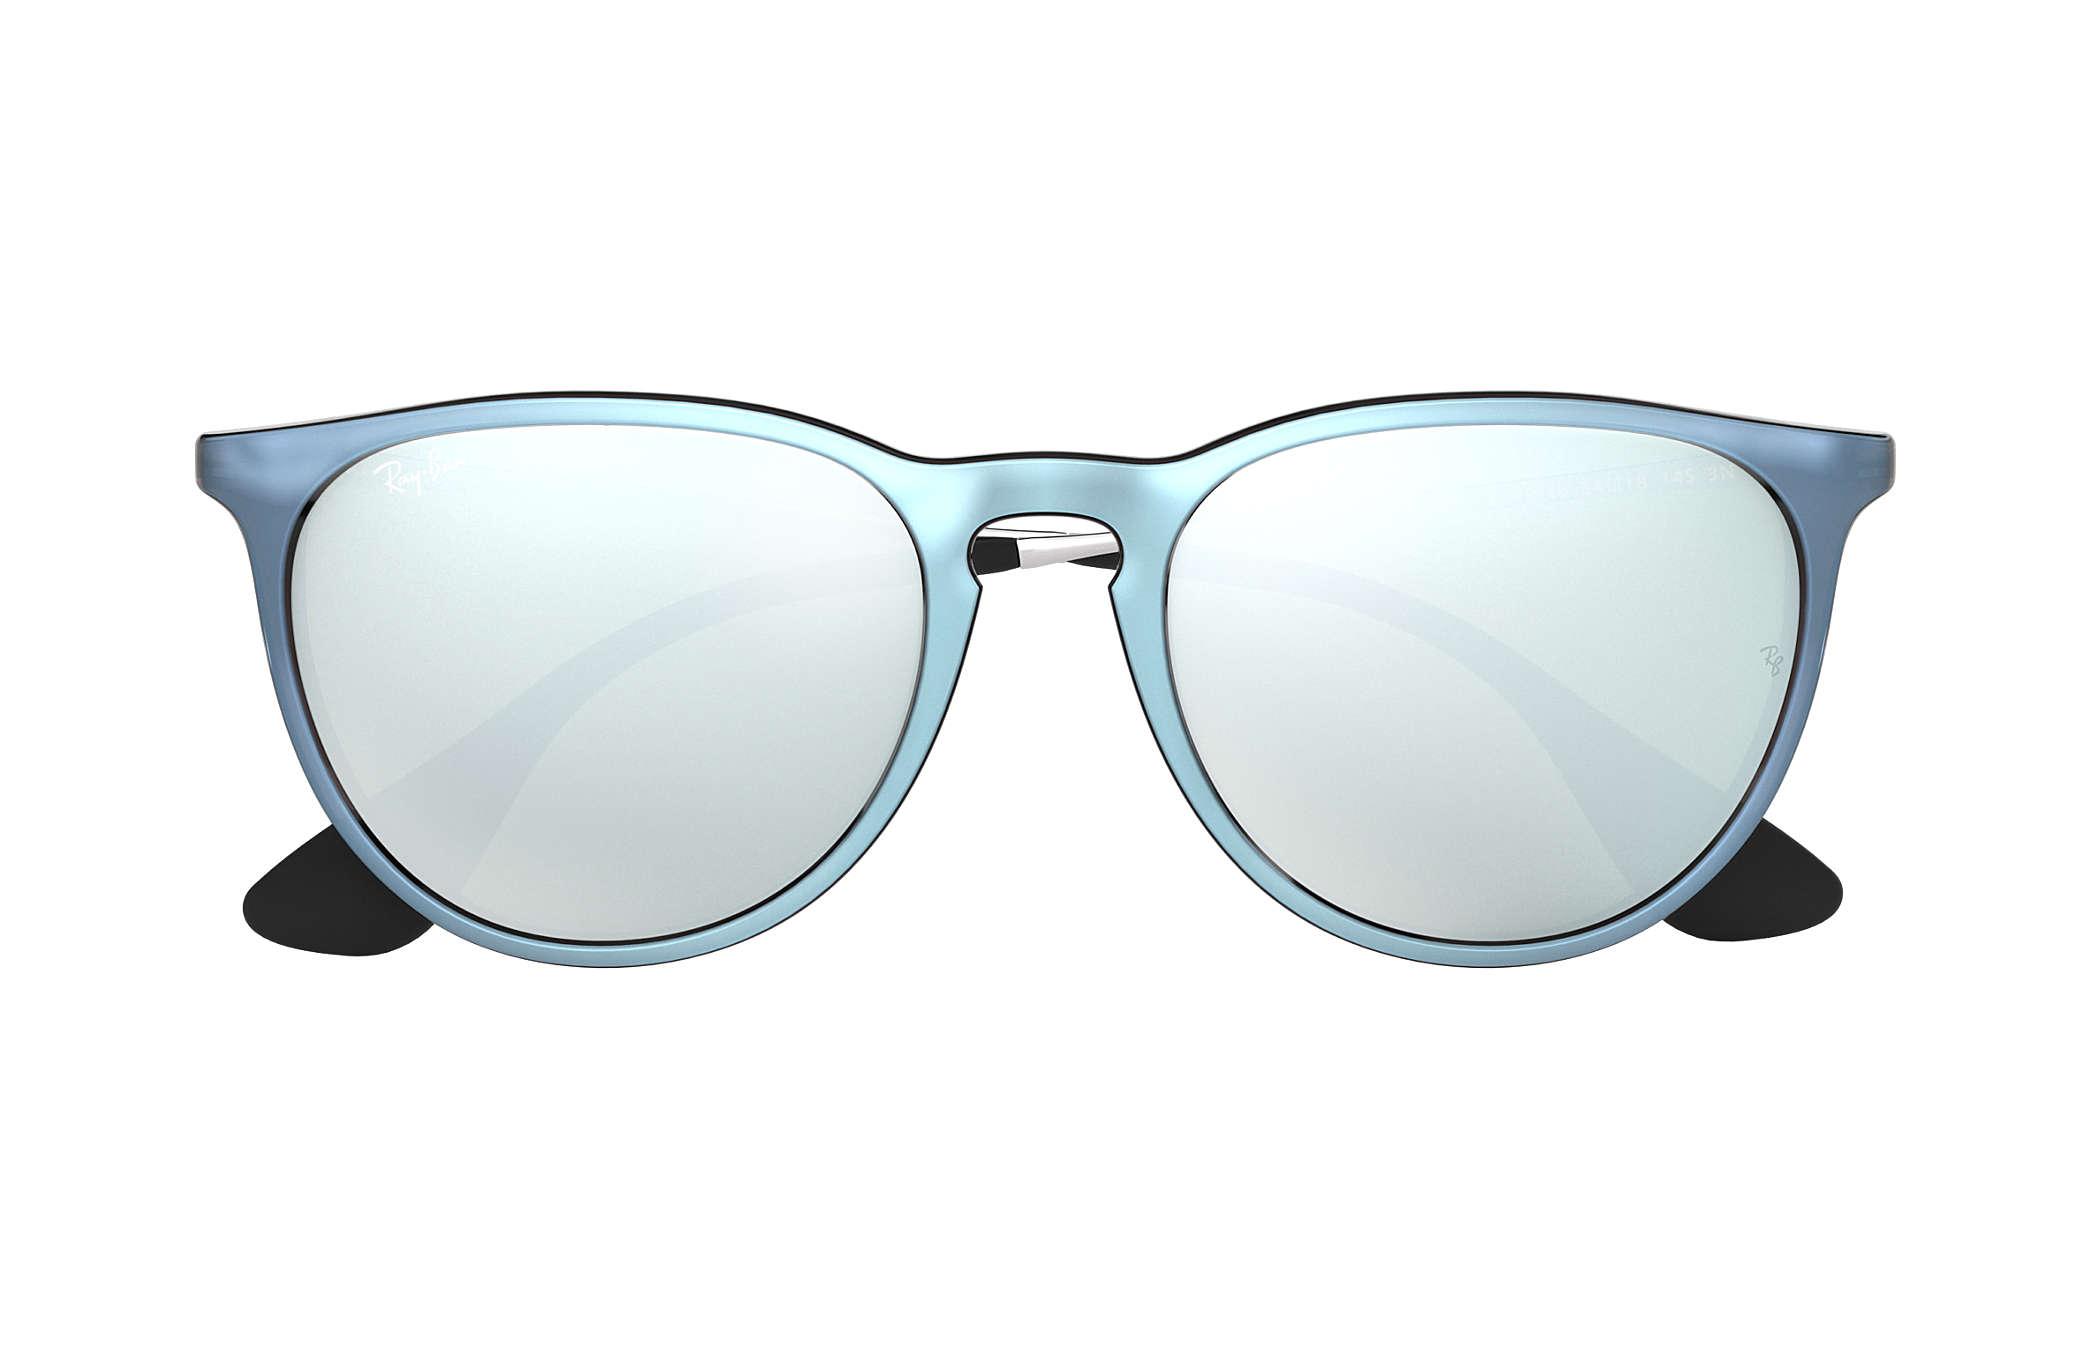 Ray-Ban Erika Color Mix RB4171 Grey - Nylon - Silver Lenses ... e8b08d60df3c5